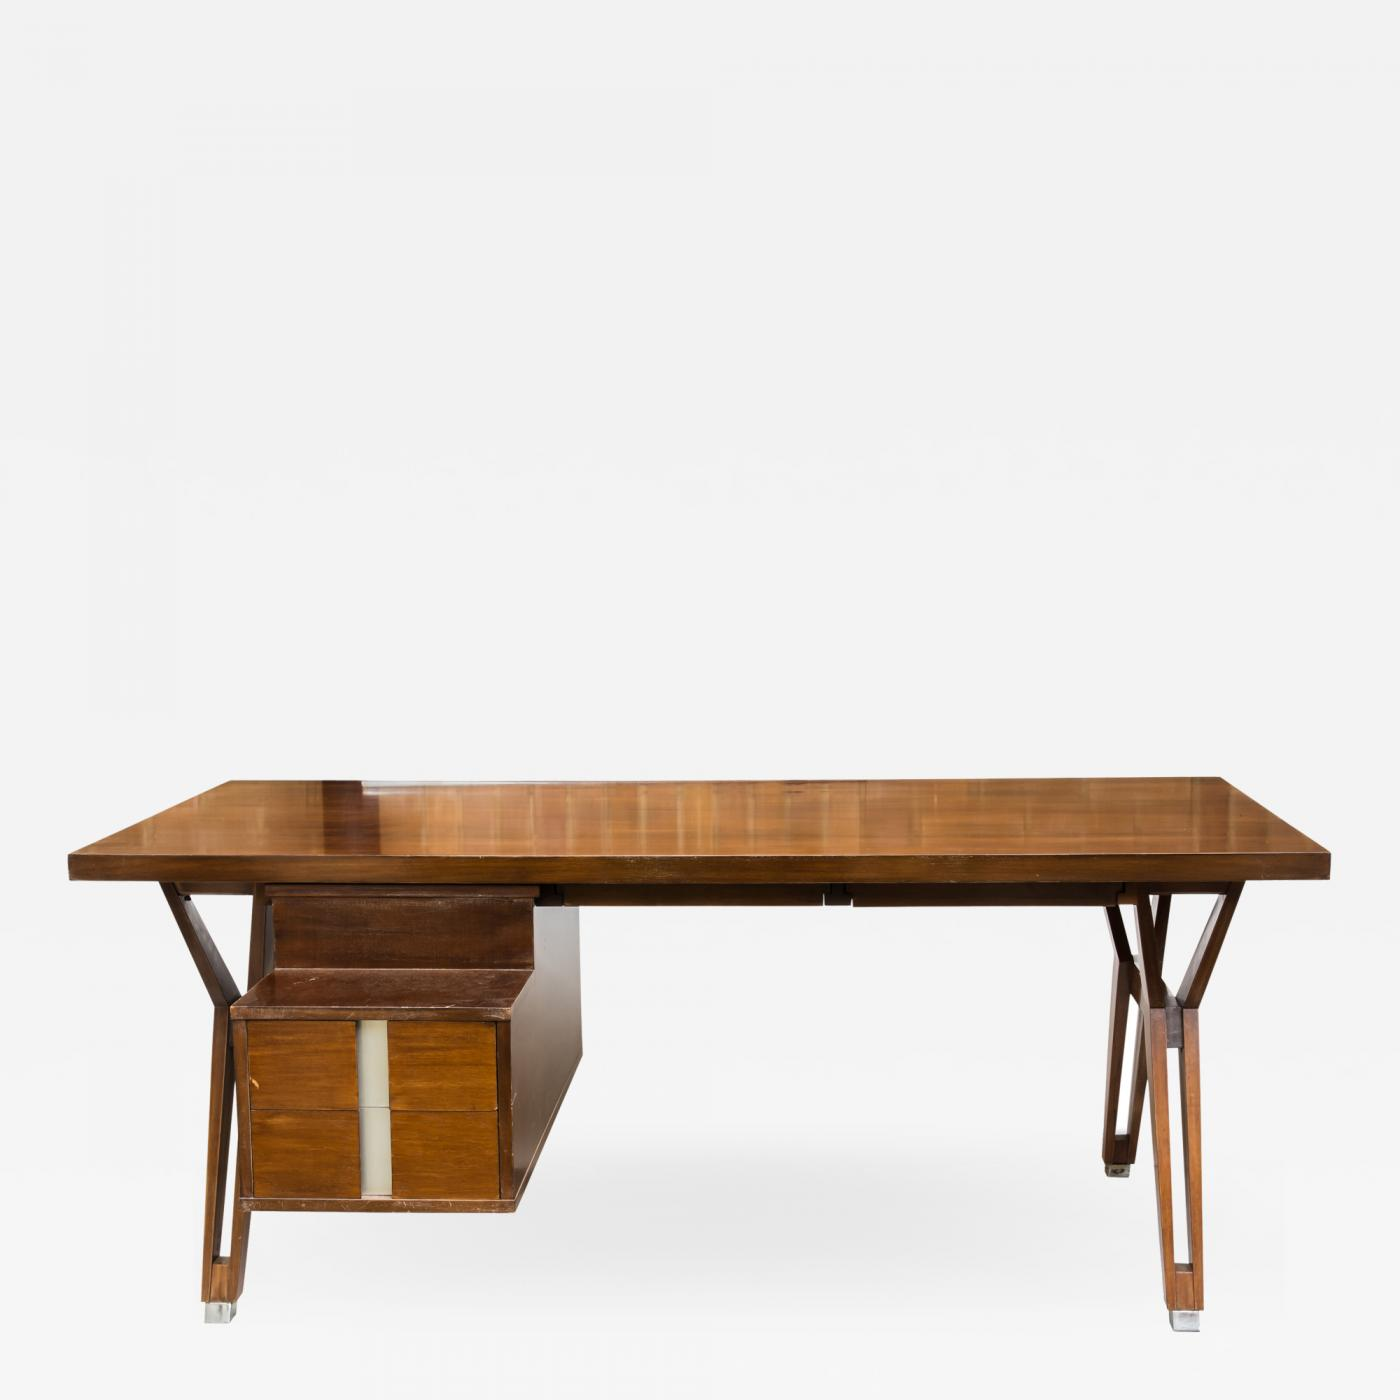 Mobili Moderni Italiani.Mim Mobili Italiani Moderni Mim Desk By Ico Parisi For Tecno